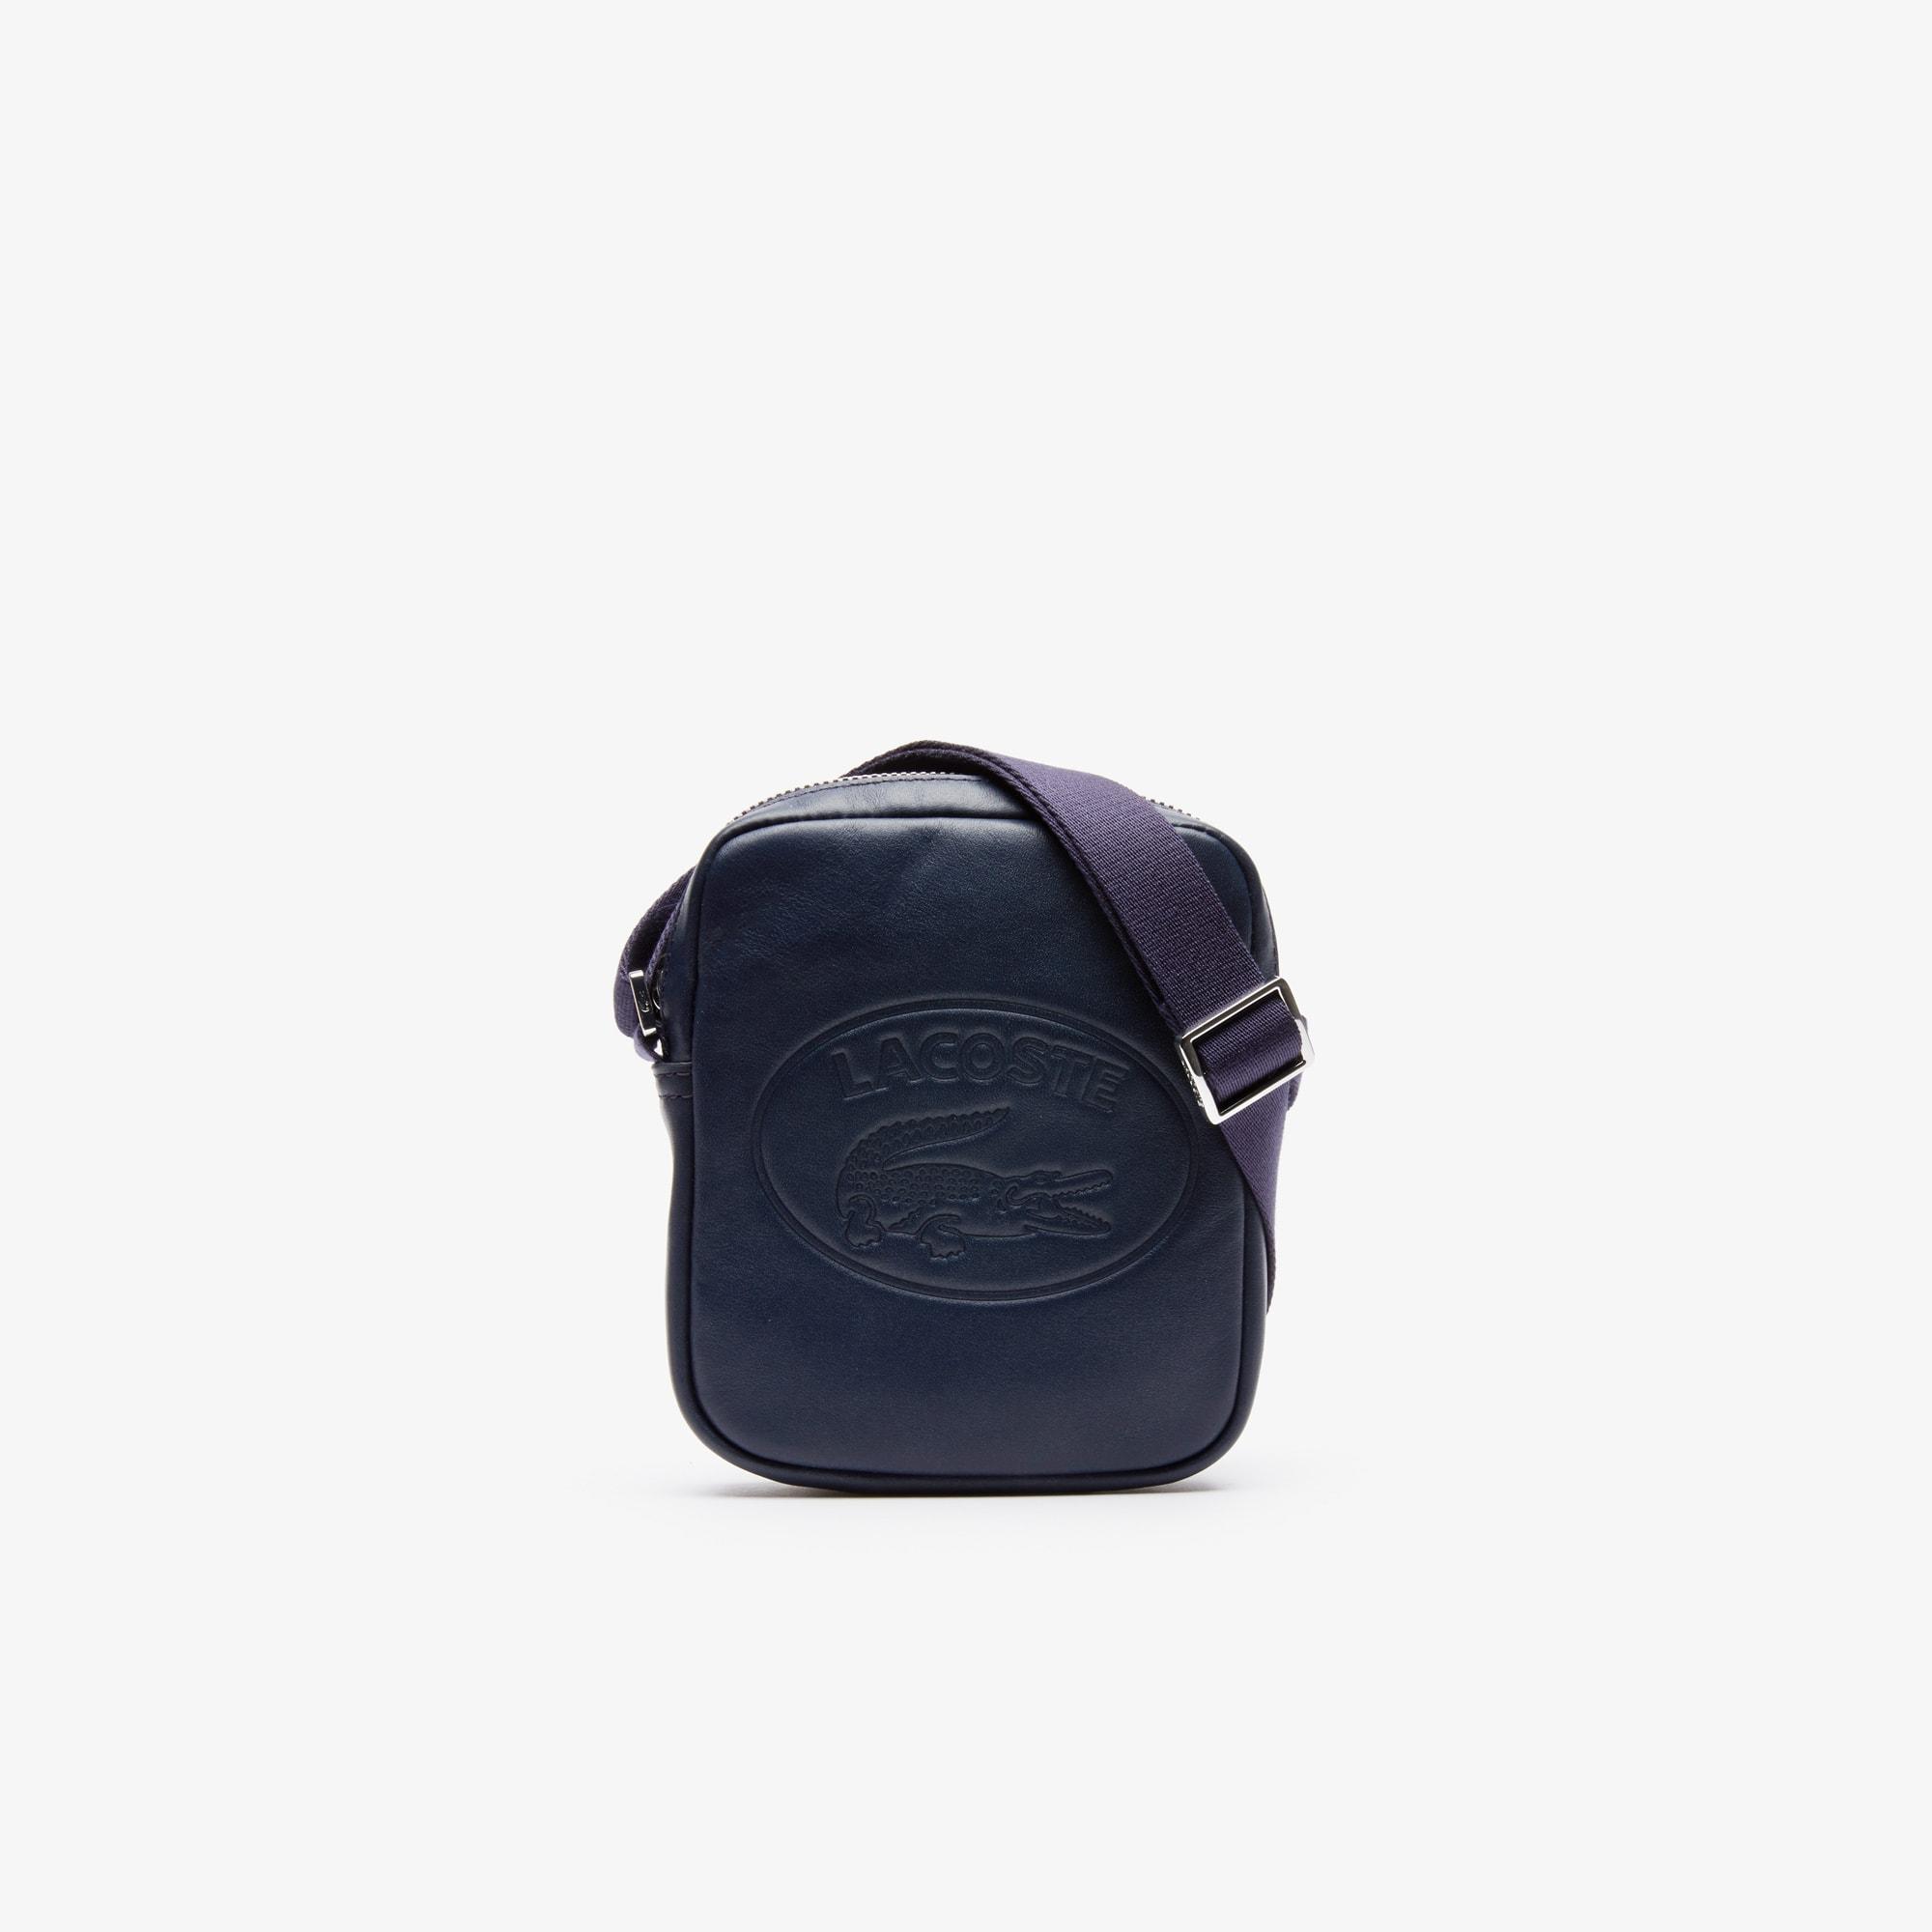 8ff4a85122 Backpacks   Bags for men